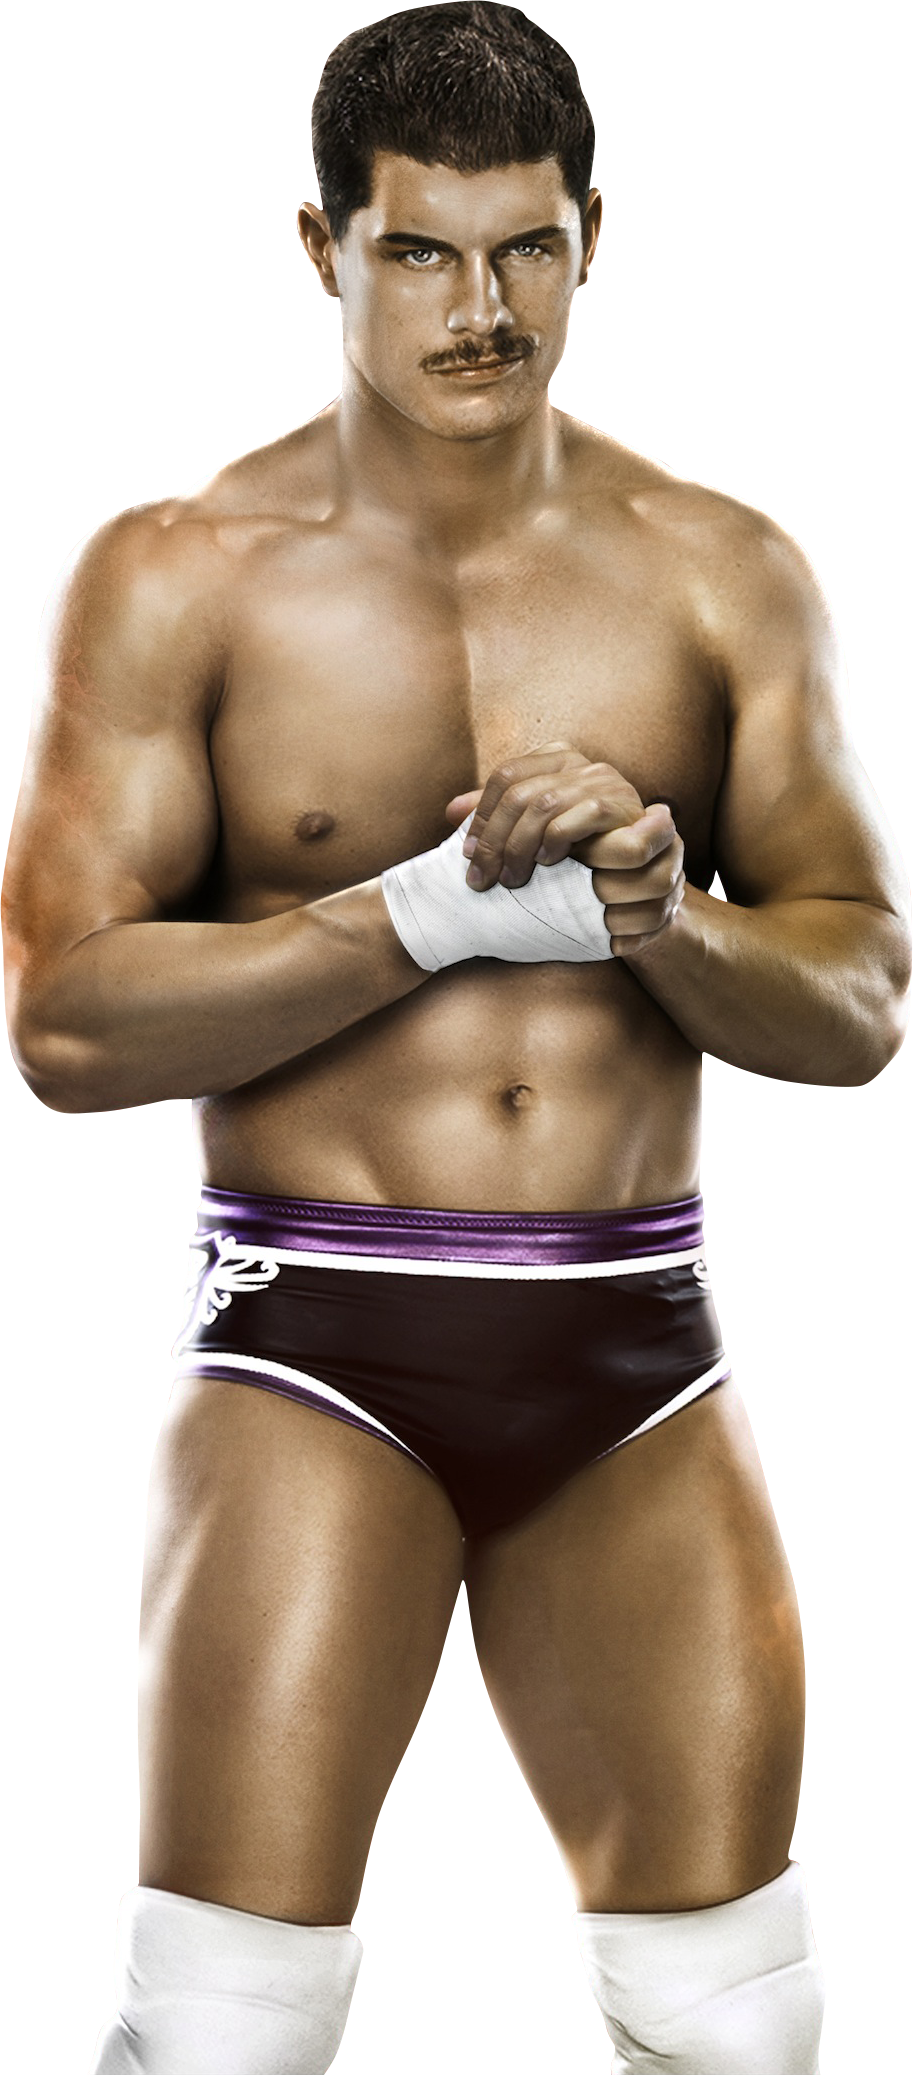 WWE 2K14 Cody Rhodes Render Cutout by ThexRealxBanks on DeviantArt